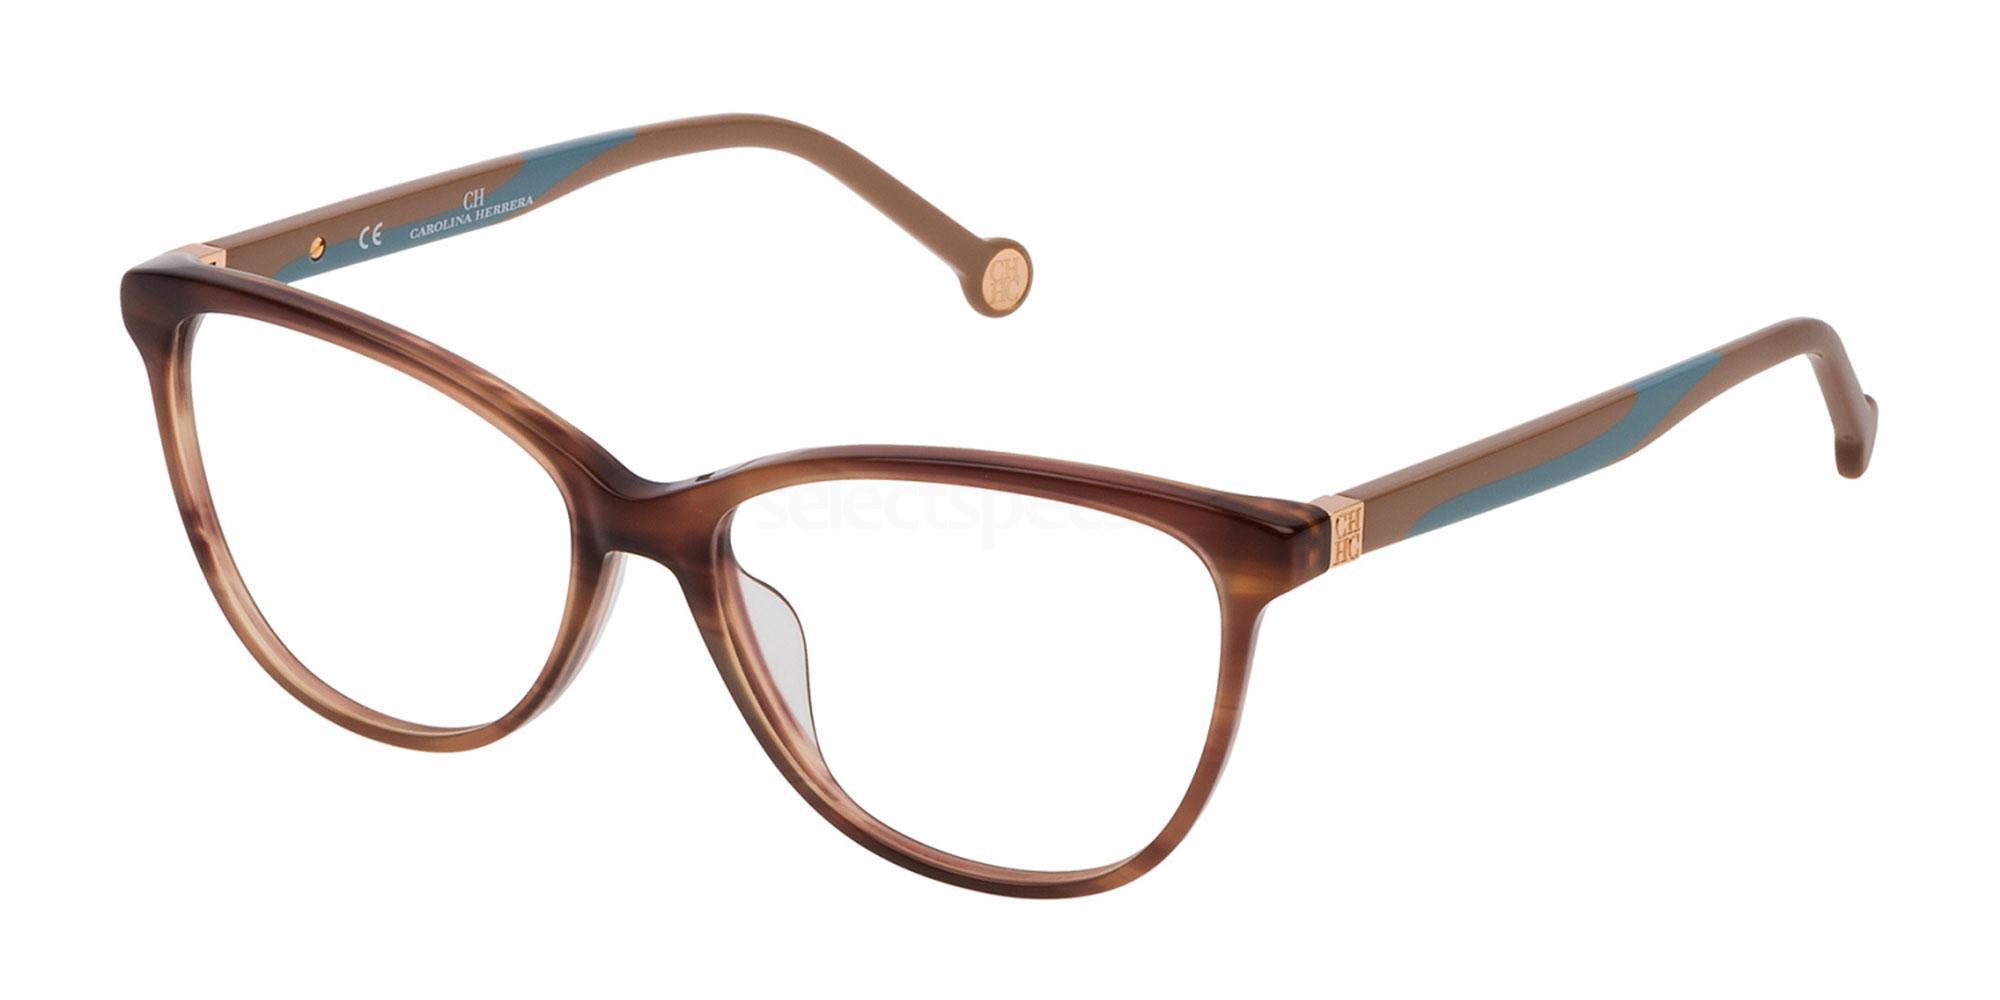 06YZ VHE770 Glasses, CH Carolina Herrera